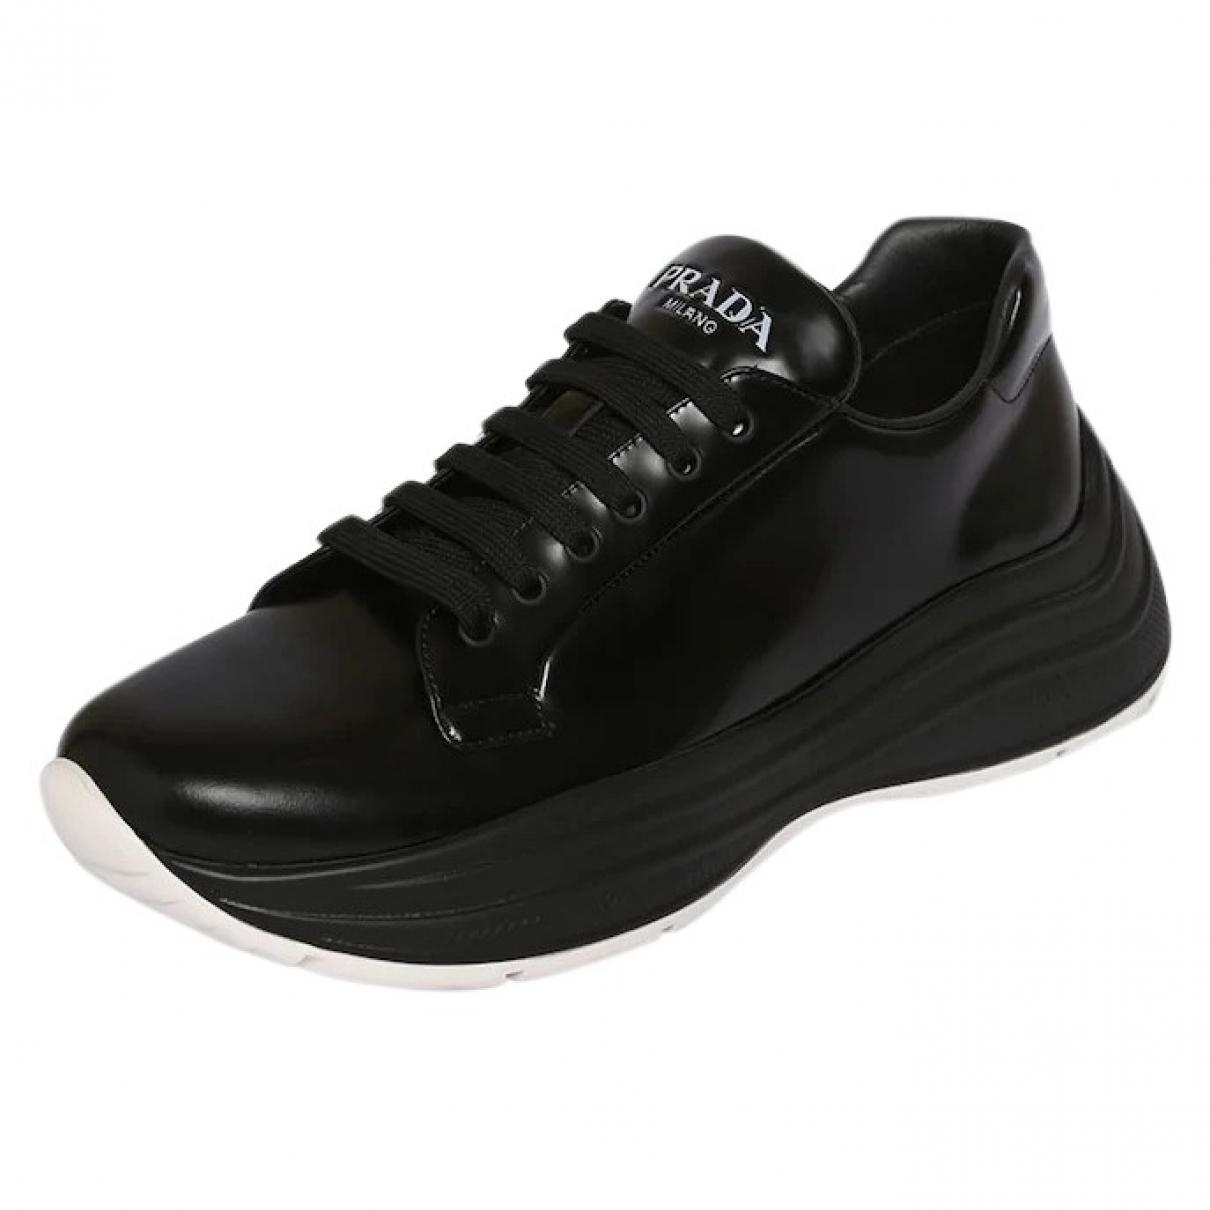 Prada \N Black Leather Trainers for Men 5 UK